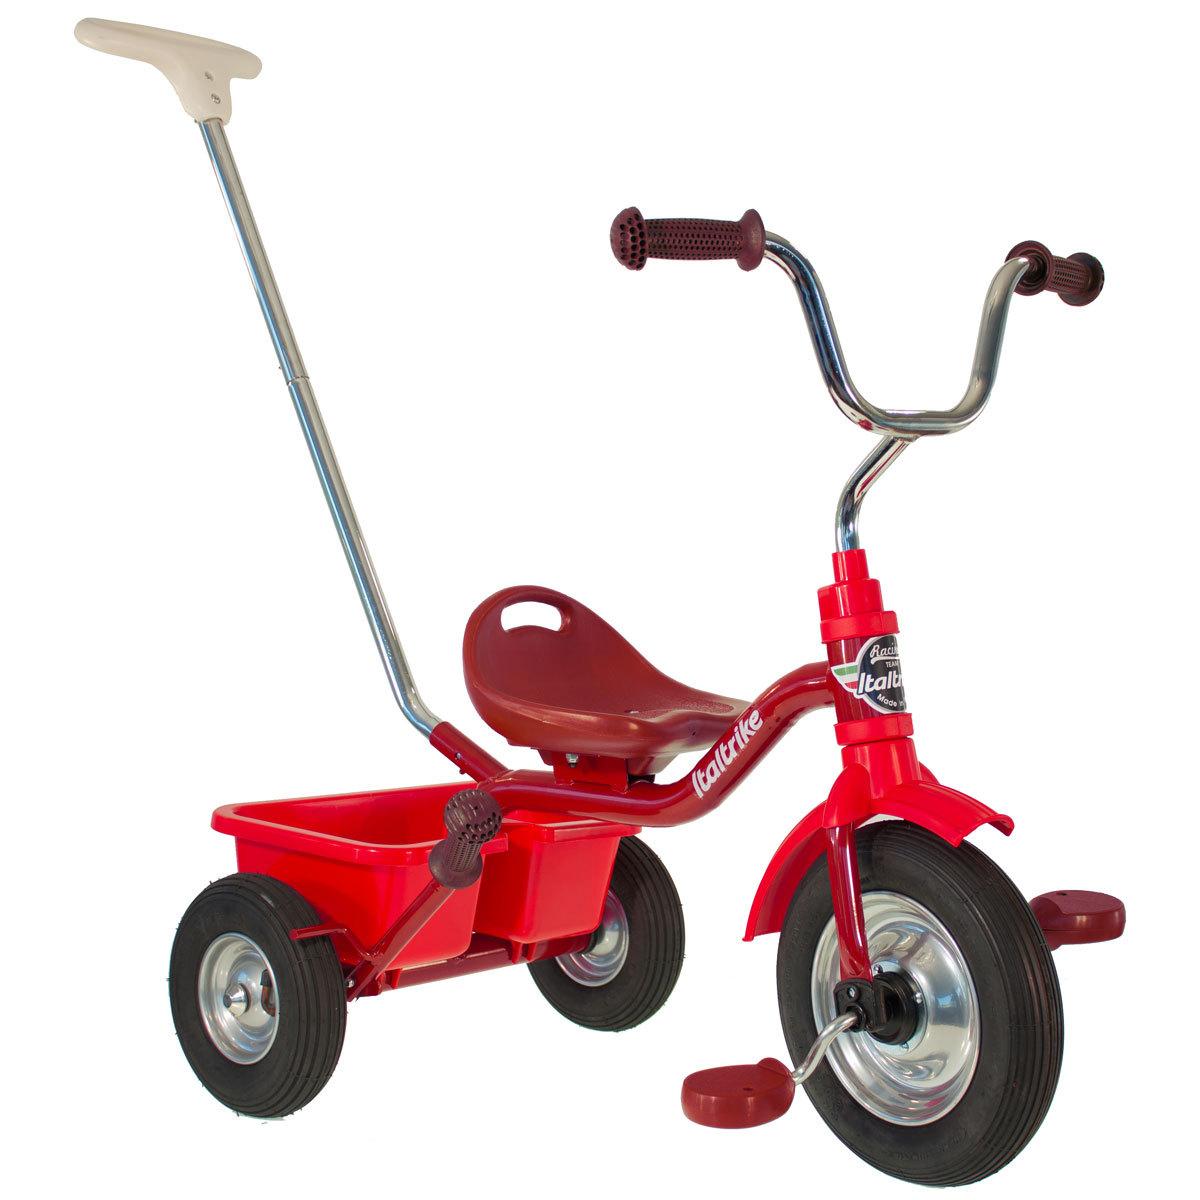 Trotteur & Porteur Tricycle Racing Monza - Rouge Tricycle Racing Monza - Rouge